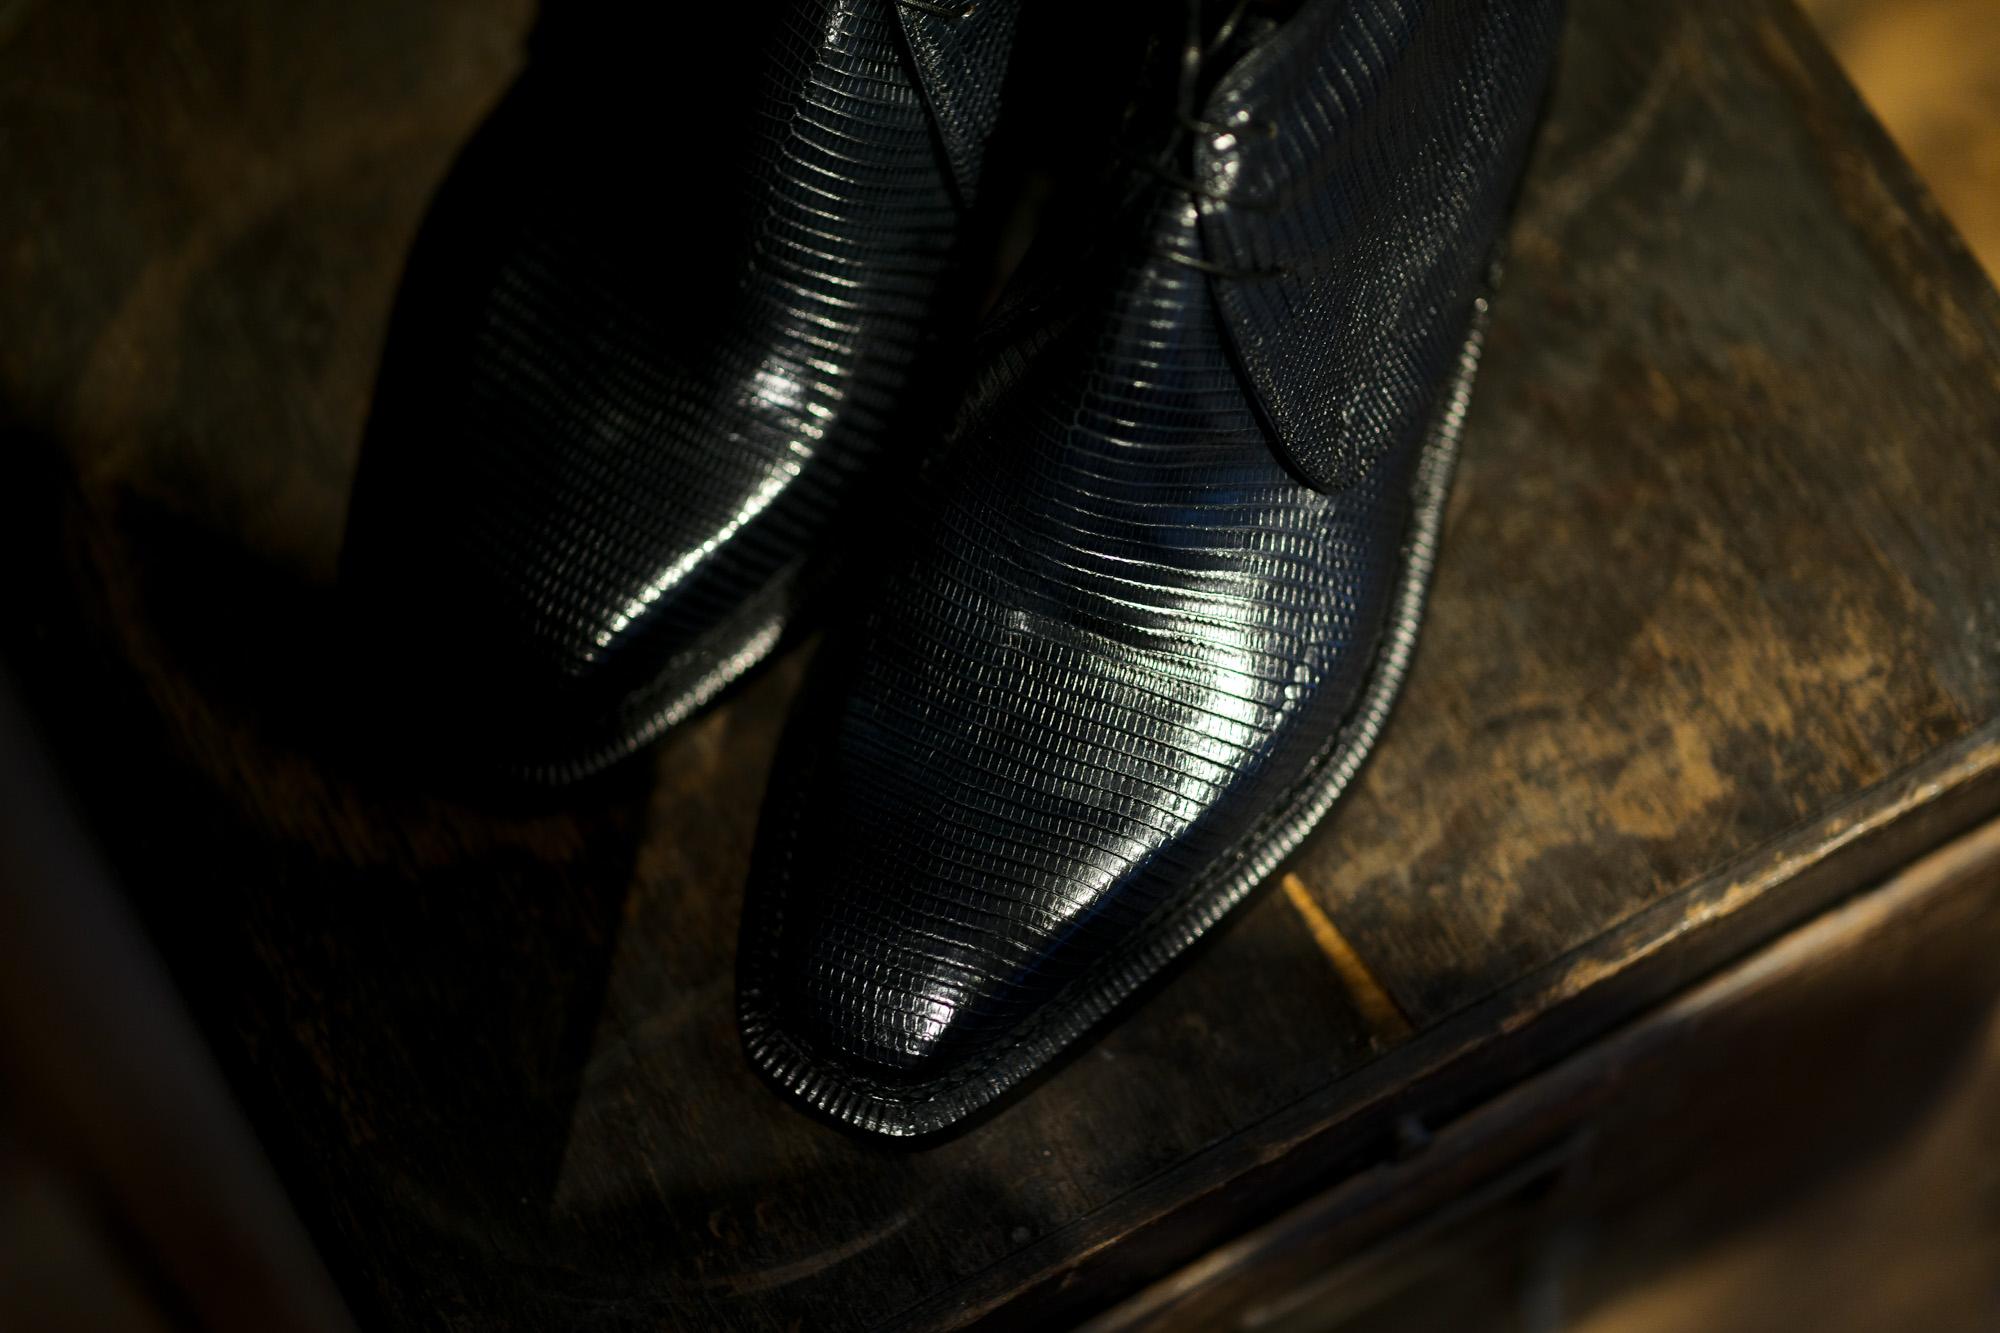 ENZO BONAFE (エンツォボナフェ) ART.3722 Chukka boots LIZARD (リザード) リザードレザー チャッカブーツ BLUE (ブルー) made in italy (イタリア製) 2021 愛知 名古屋 Alto e Diritto altoediritto アルトエデリット